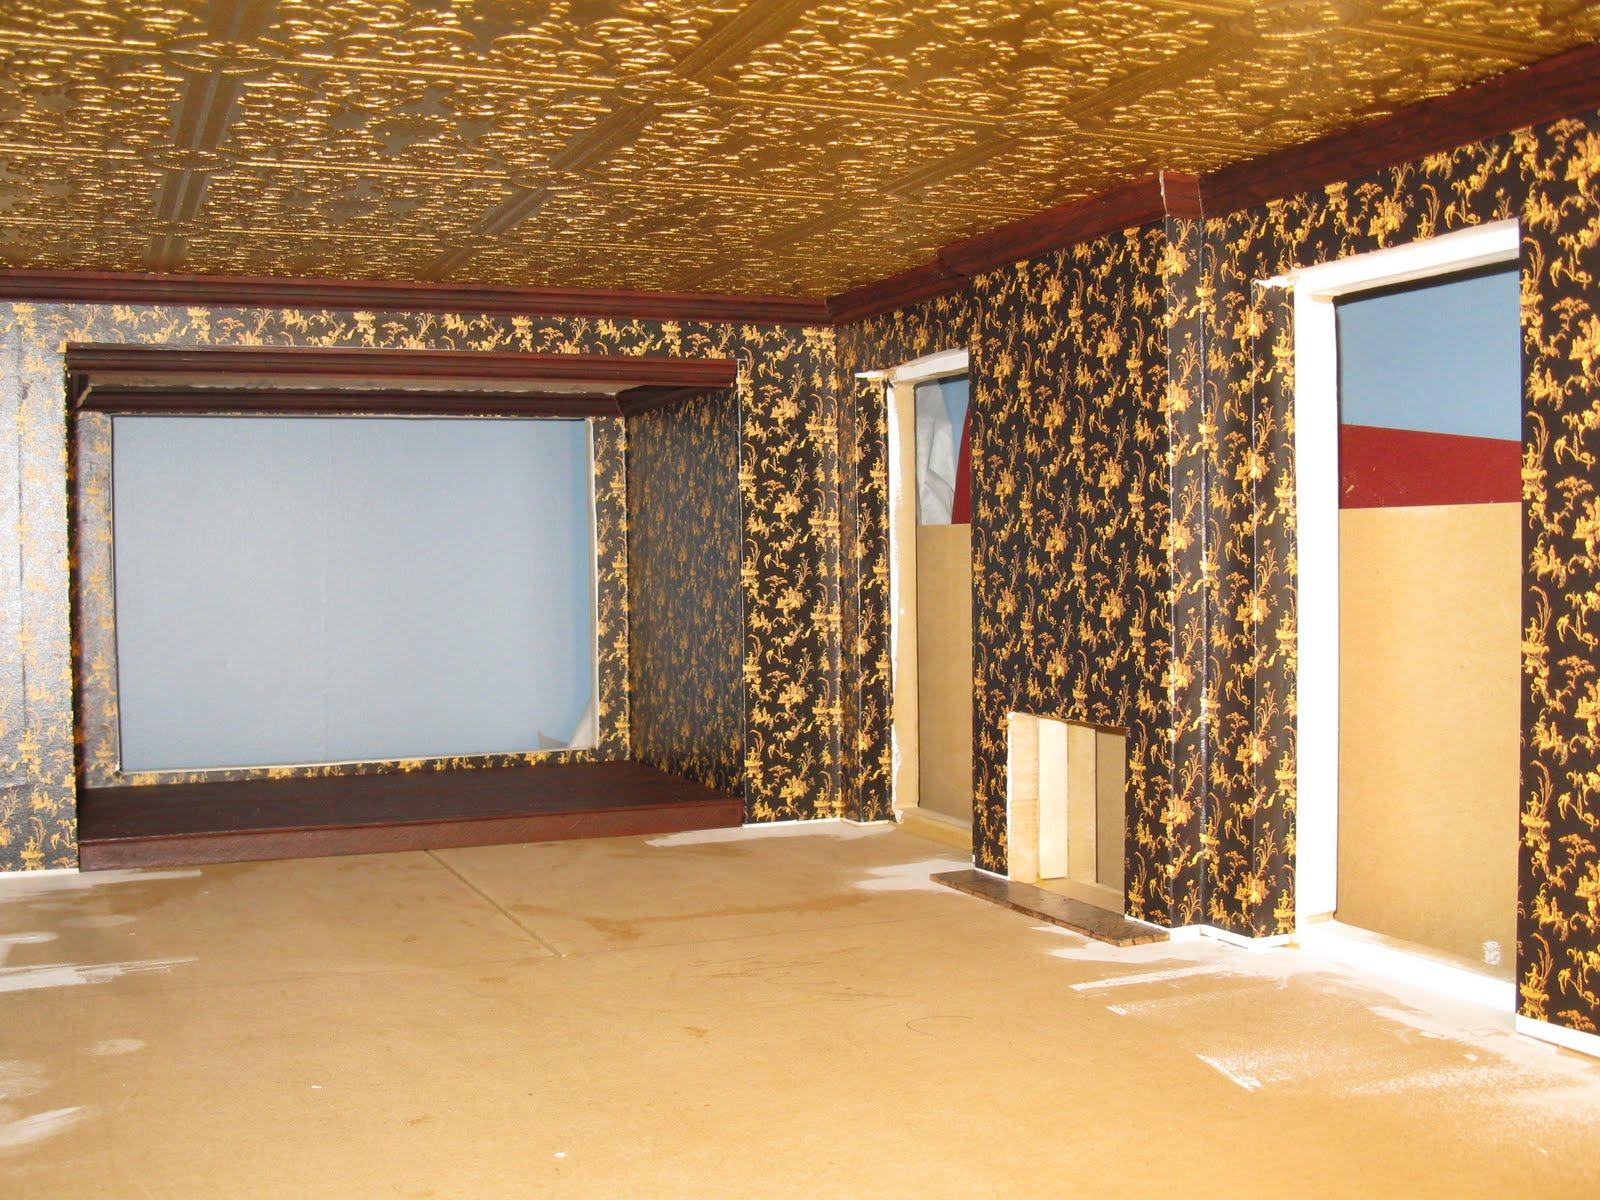 46 dollhouse ceiling wallpaper on wallpapersafari - Late victorian wallpaper ...